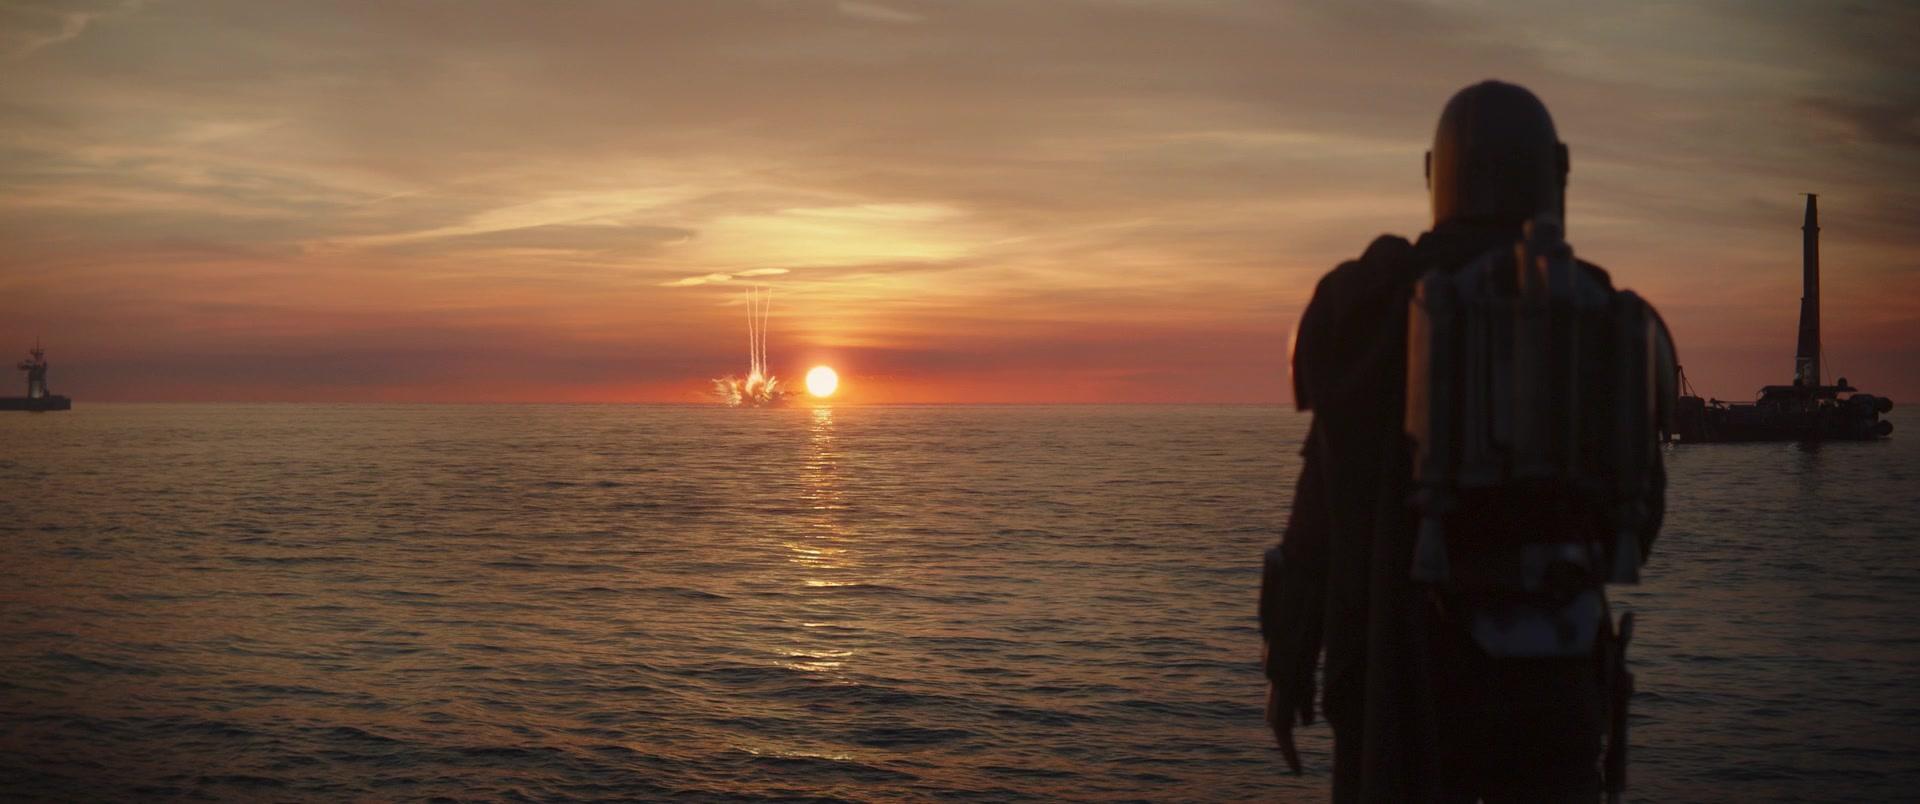 star wars series the mandalorian chapter 11 boat explosion din djarin